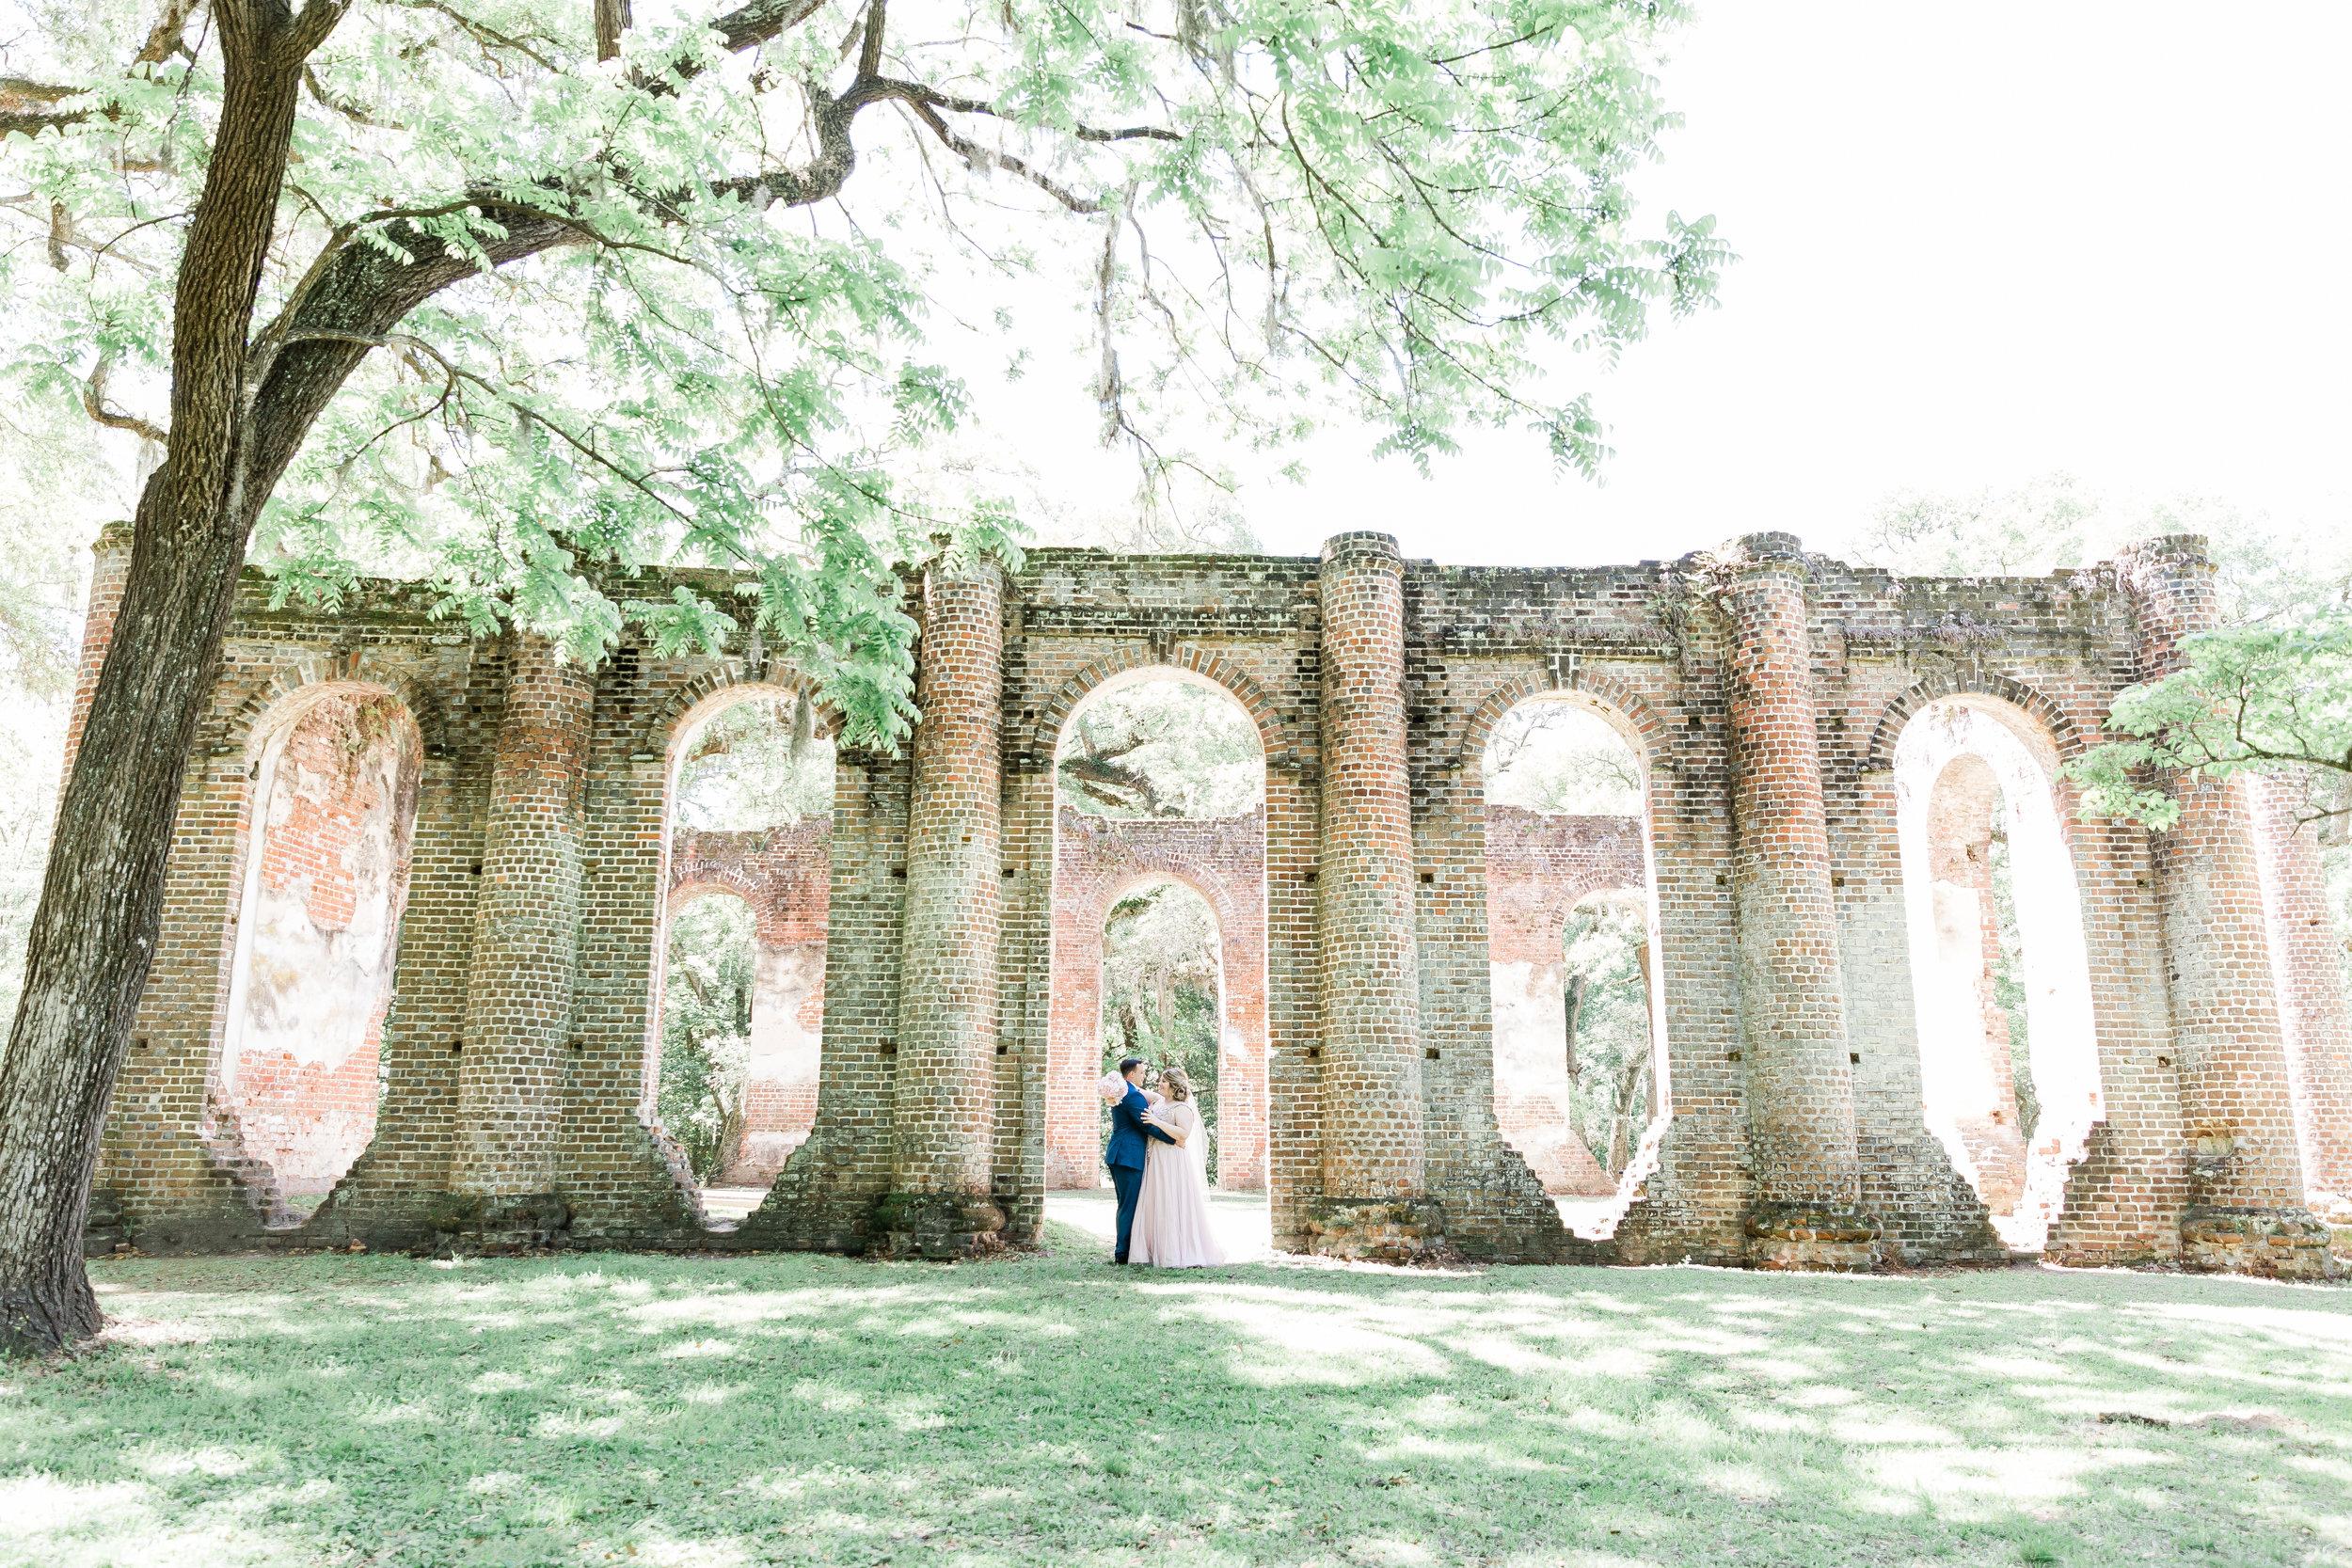 20190417-Southern Lens Photography-savannah family photographer- Ashley and Zack-old sheldon church ruins-201953.jpg